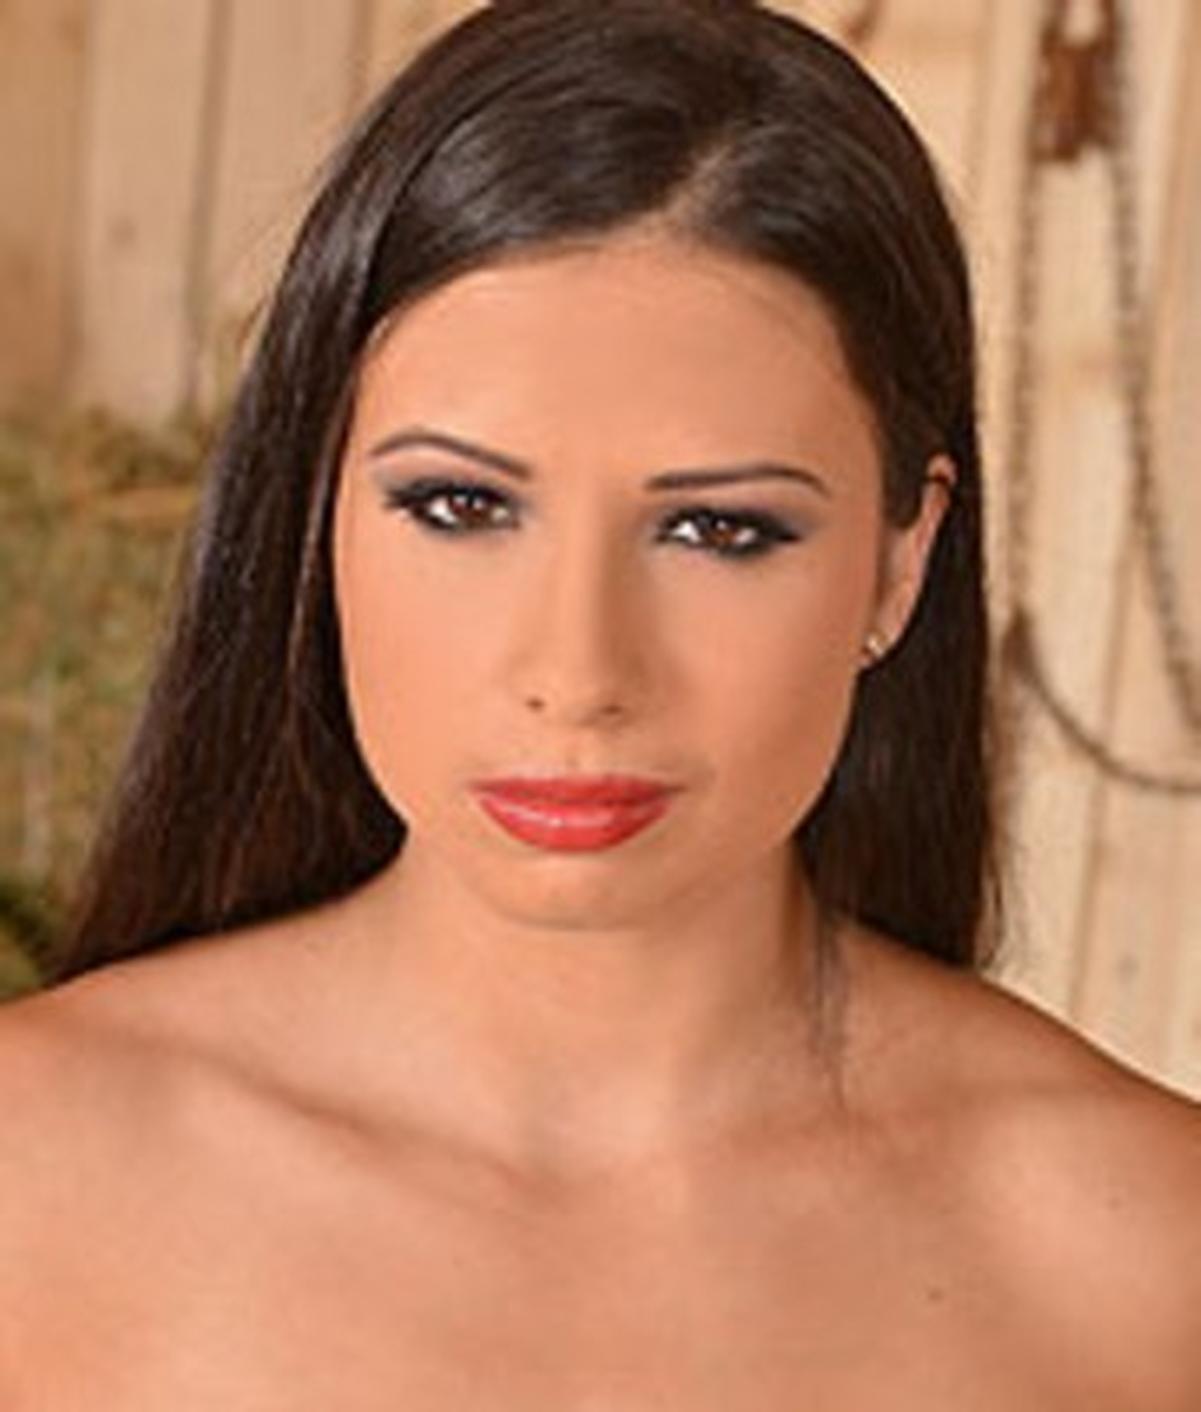 Big tits brunette Mira Cuchold is enjoying a big cock in her cunt № 629267 без смс